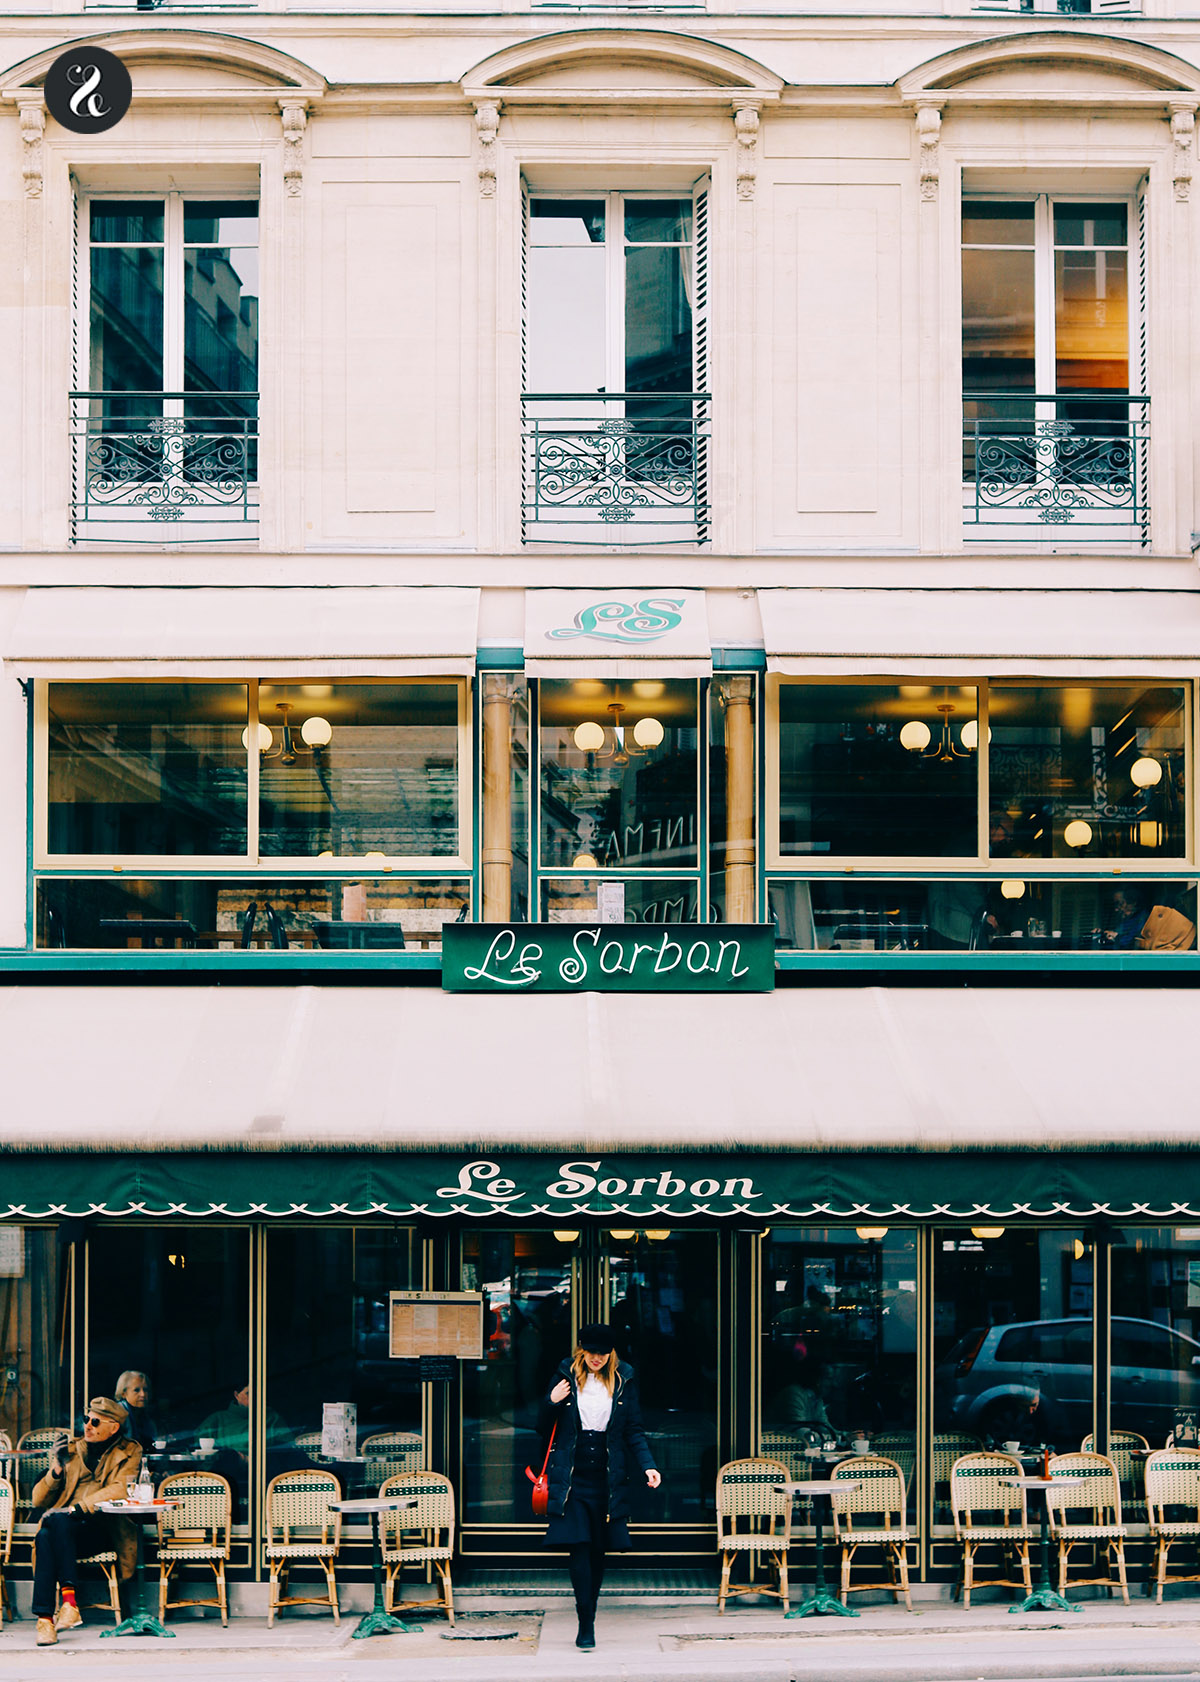 Le Sorbon café braserie Paris guía